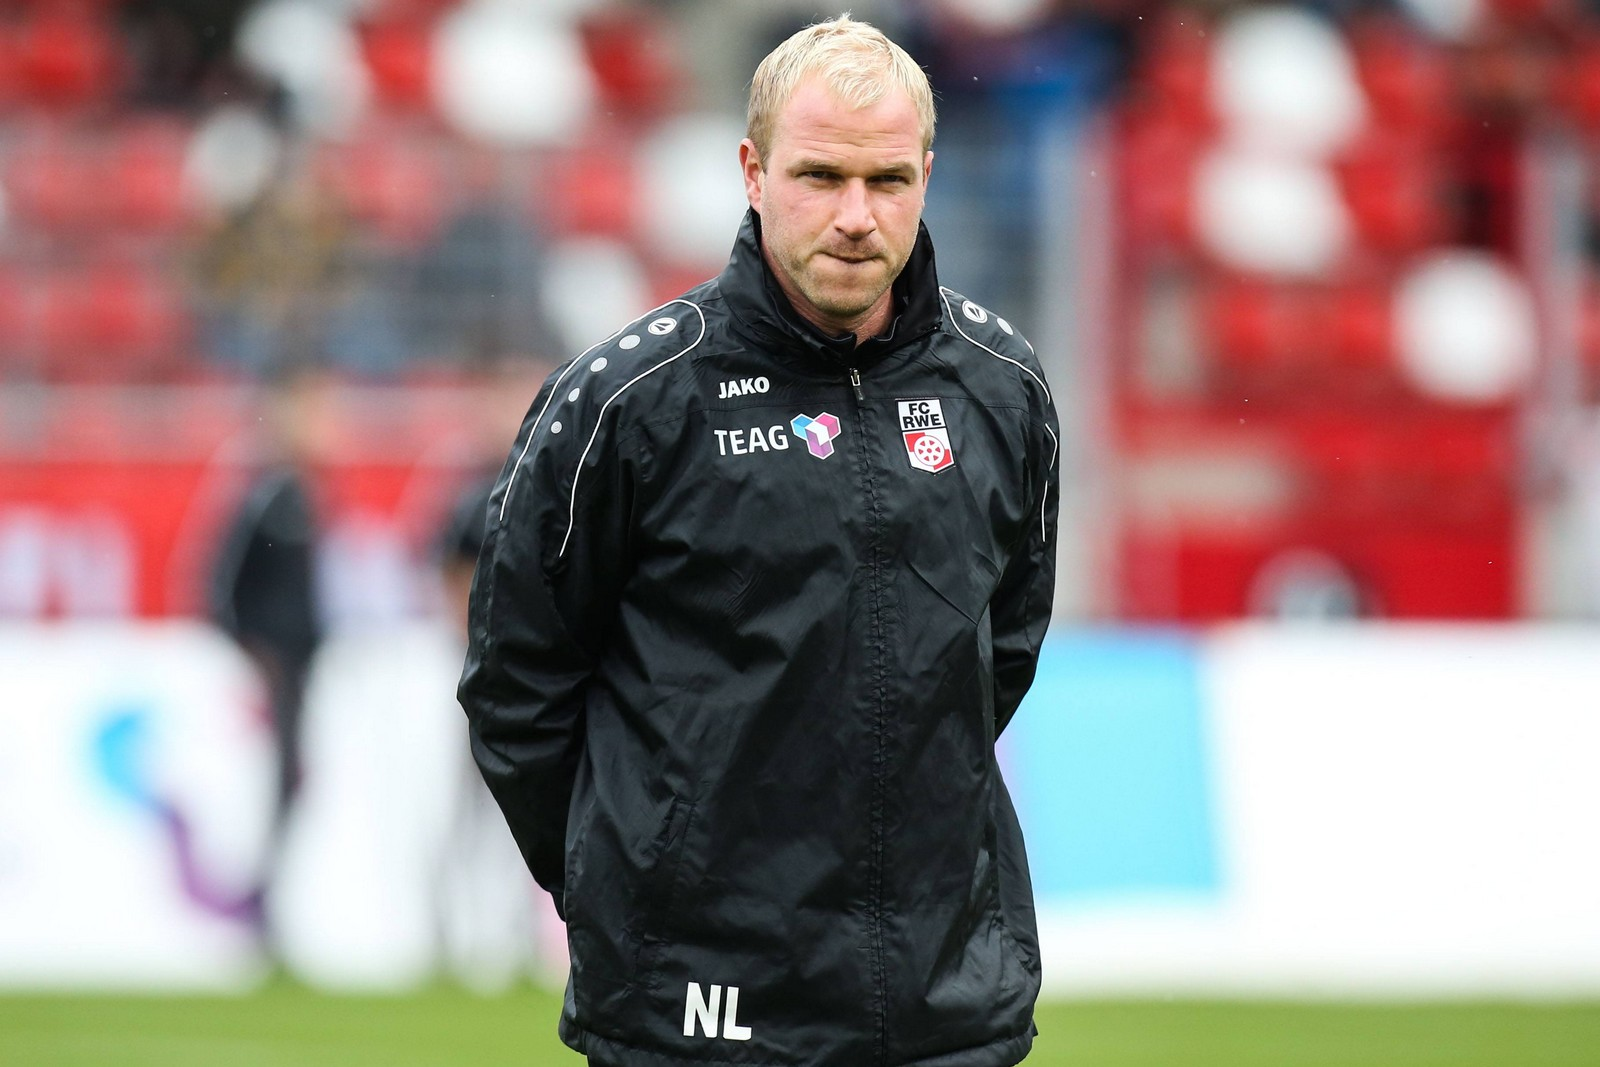 Norman Loose als Co-Trainer bei Rot-Weiß Erfurt